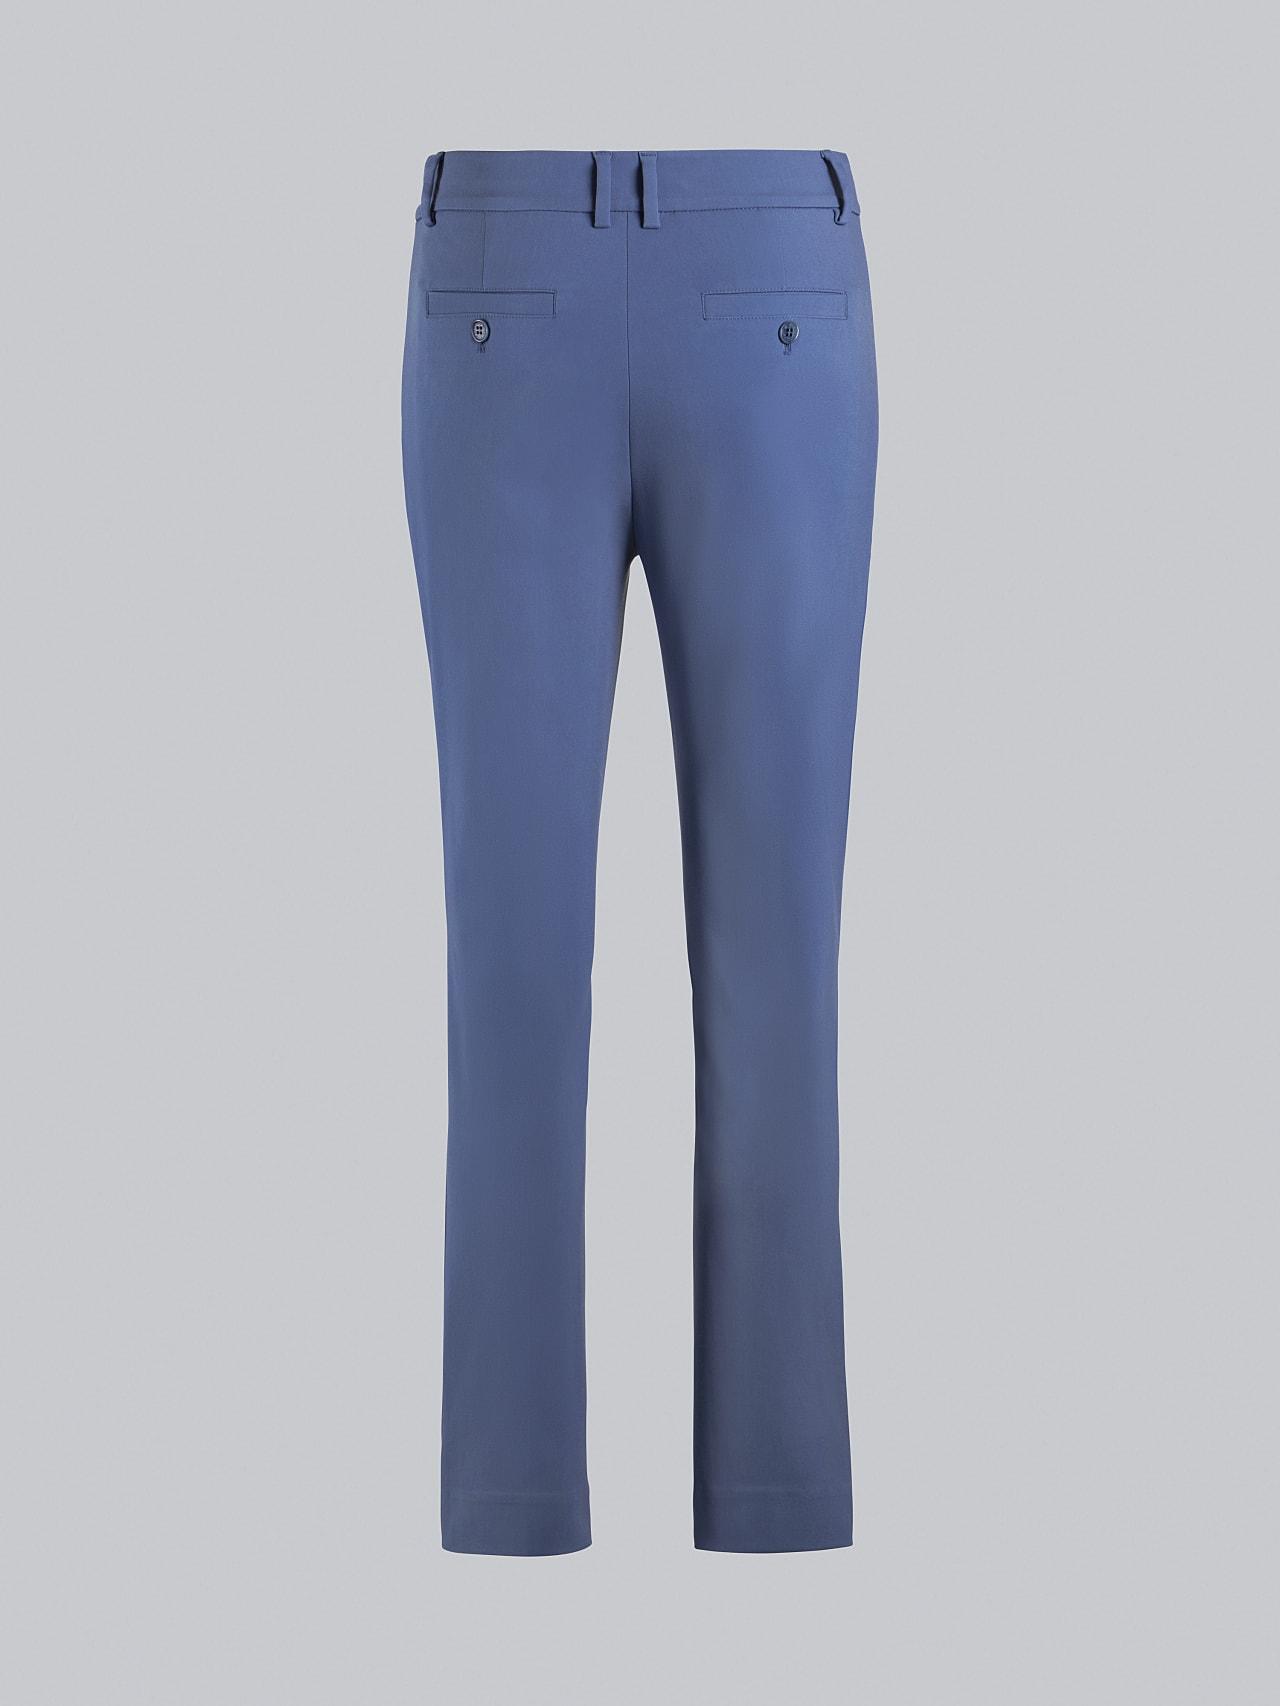 PERTI V1.Y5.02 Slim-Fit Tapered Pants light blue Left Alpha Tauri